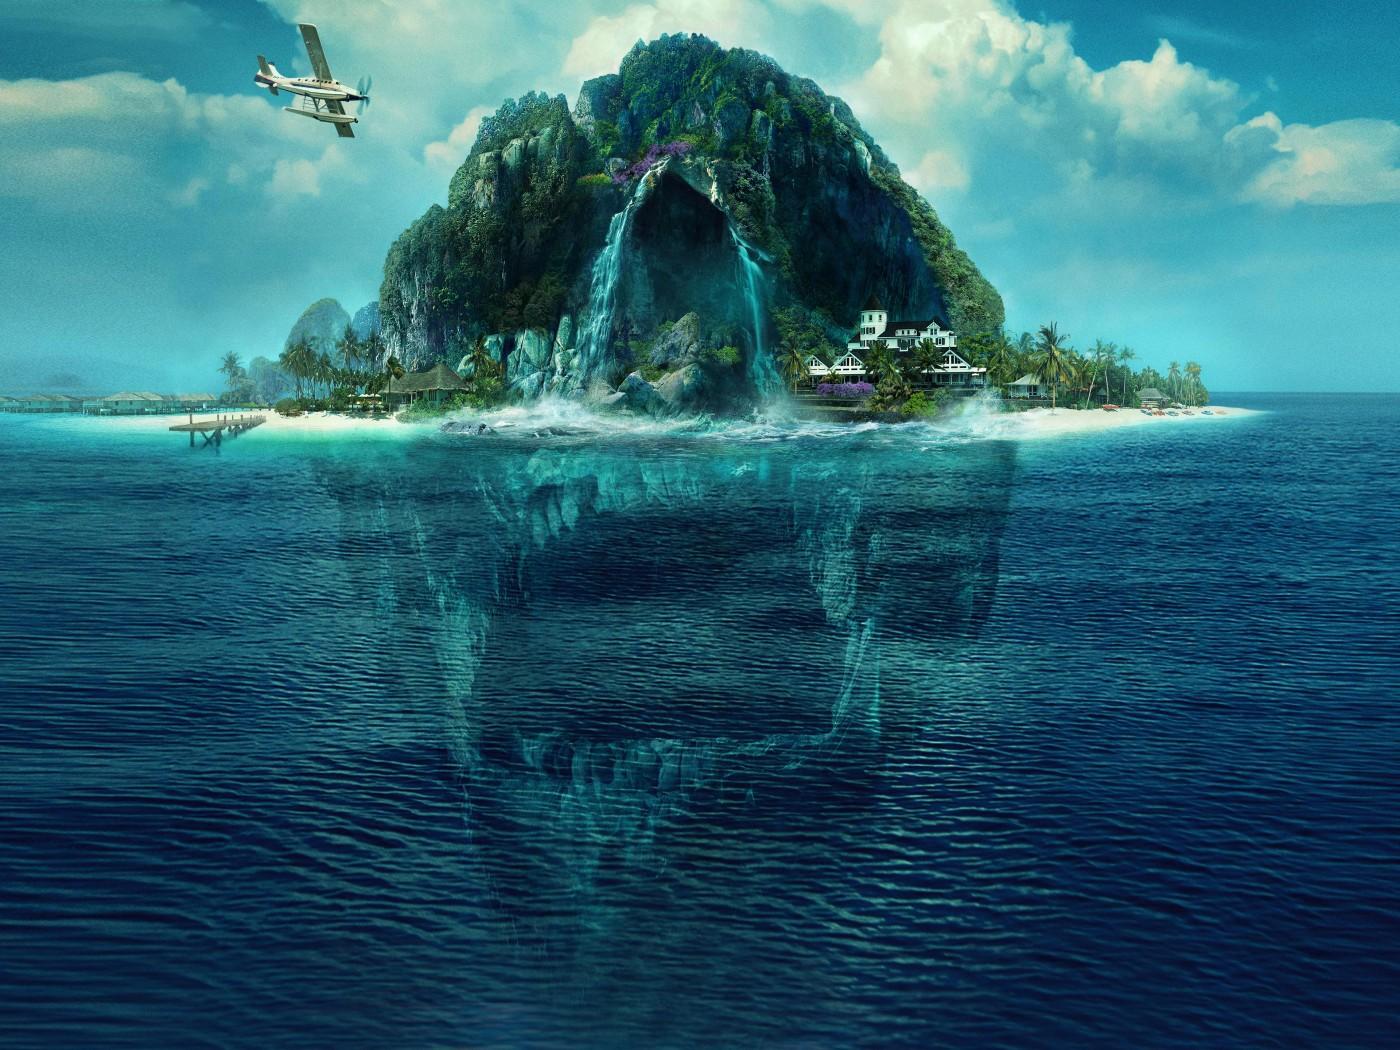 Fantasy Island 2020 4K 5K HD desktop wallpaper Widescreen High 1400x1050